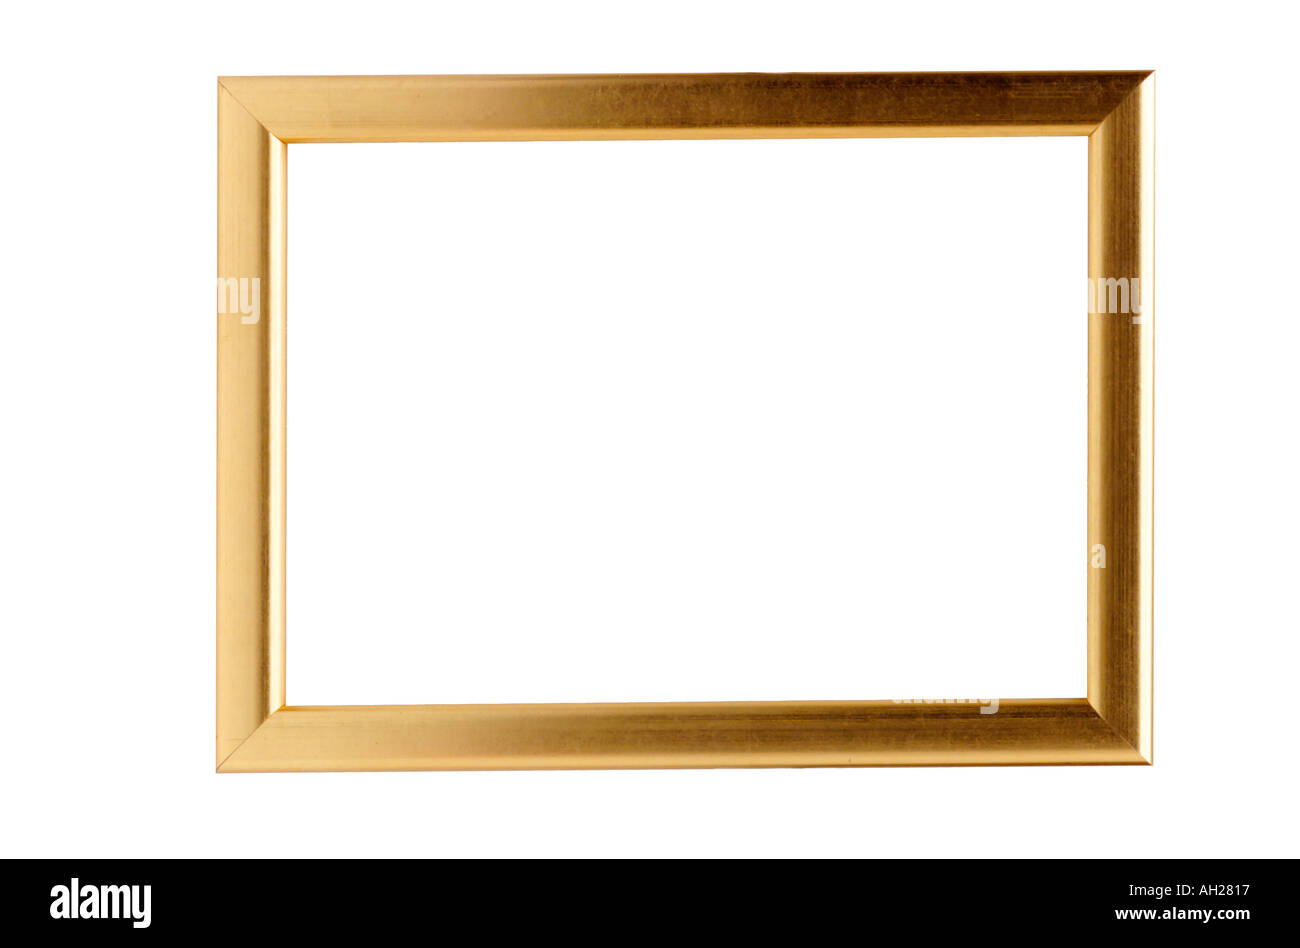 Gold Frame Border Simple Stock Photos & Gold Frame Border Simple ...